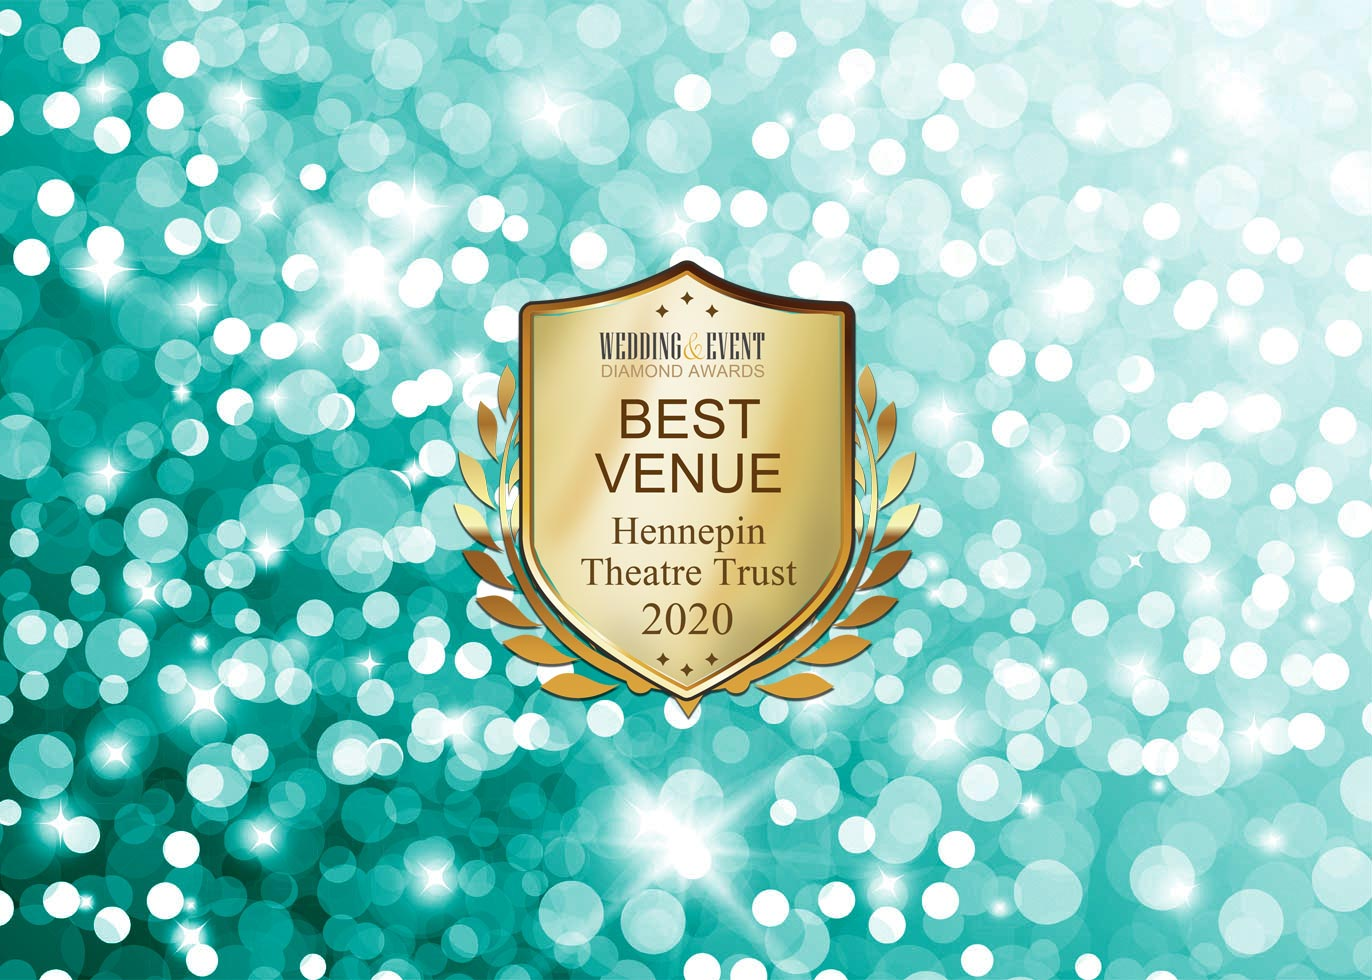 Hennepin Theatre Trust – Best Venue Diamond Award